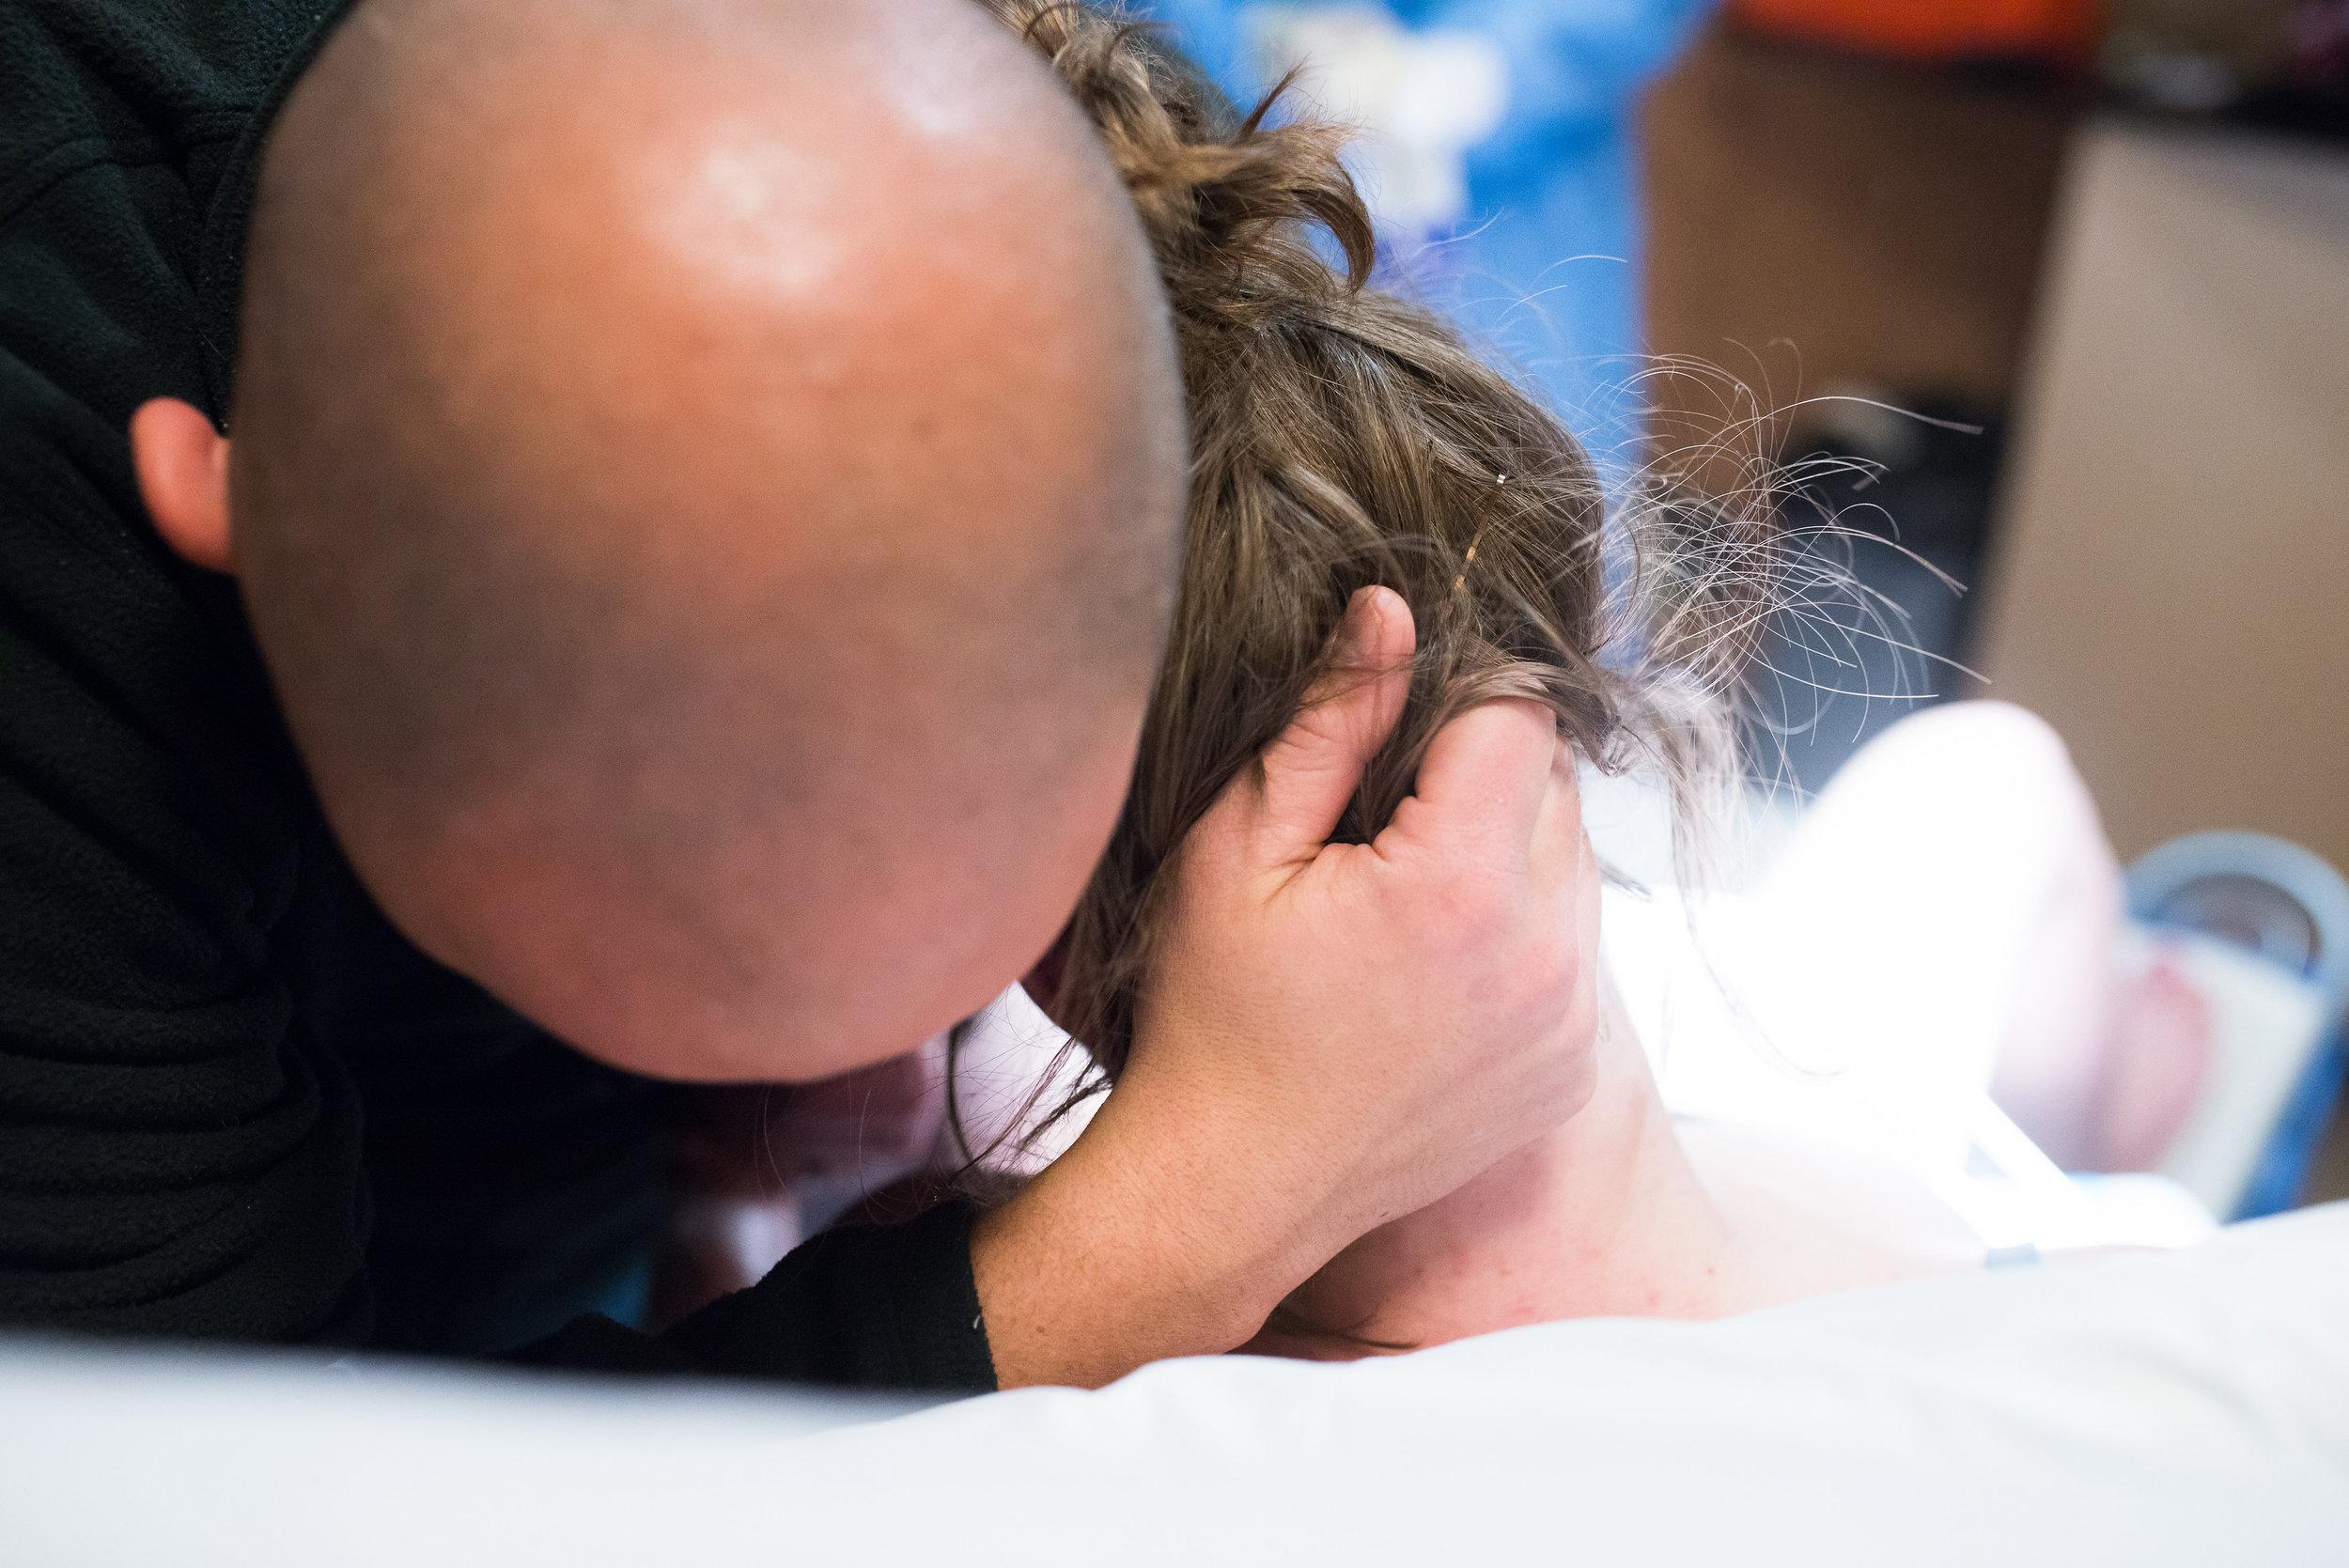 Denver-birth-photography-hypnobirthing-partner-support